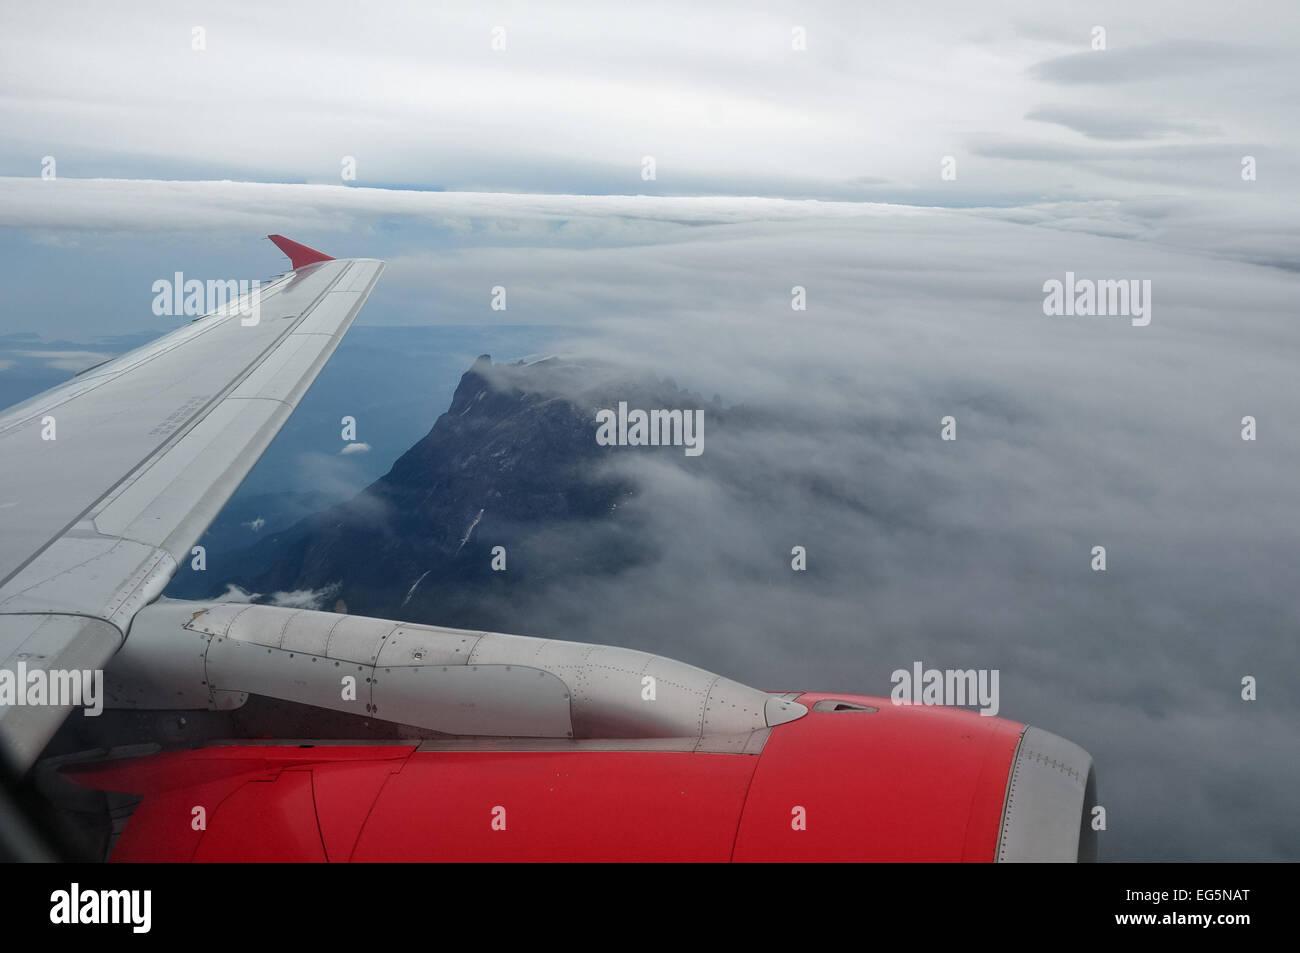 Mount Kinabalu, Sabah, East Malaysia, Borneo - as seen from plane - Stock Image